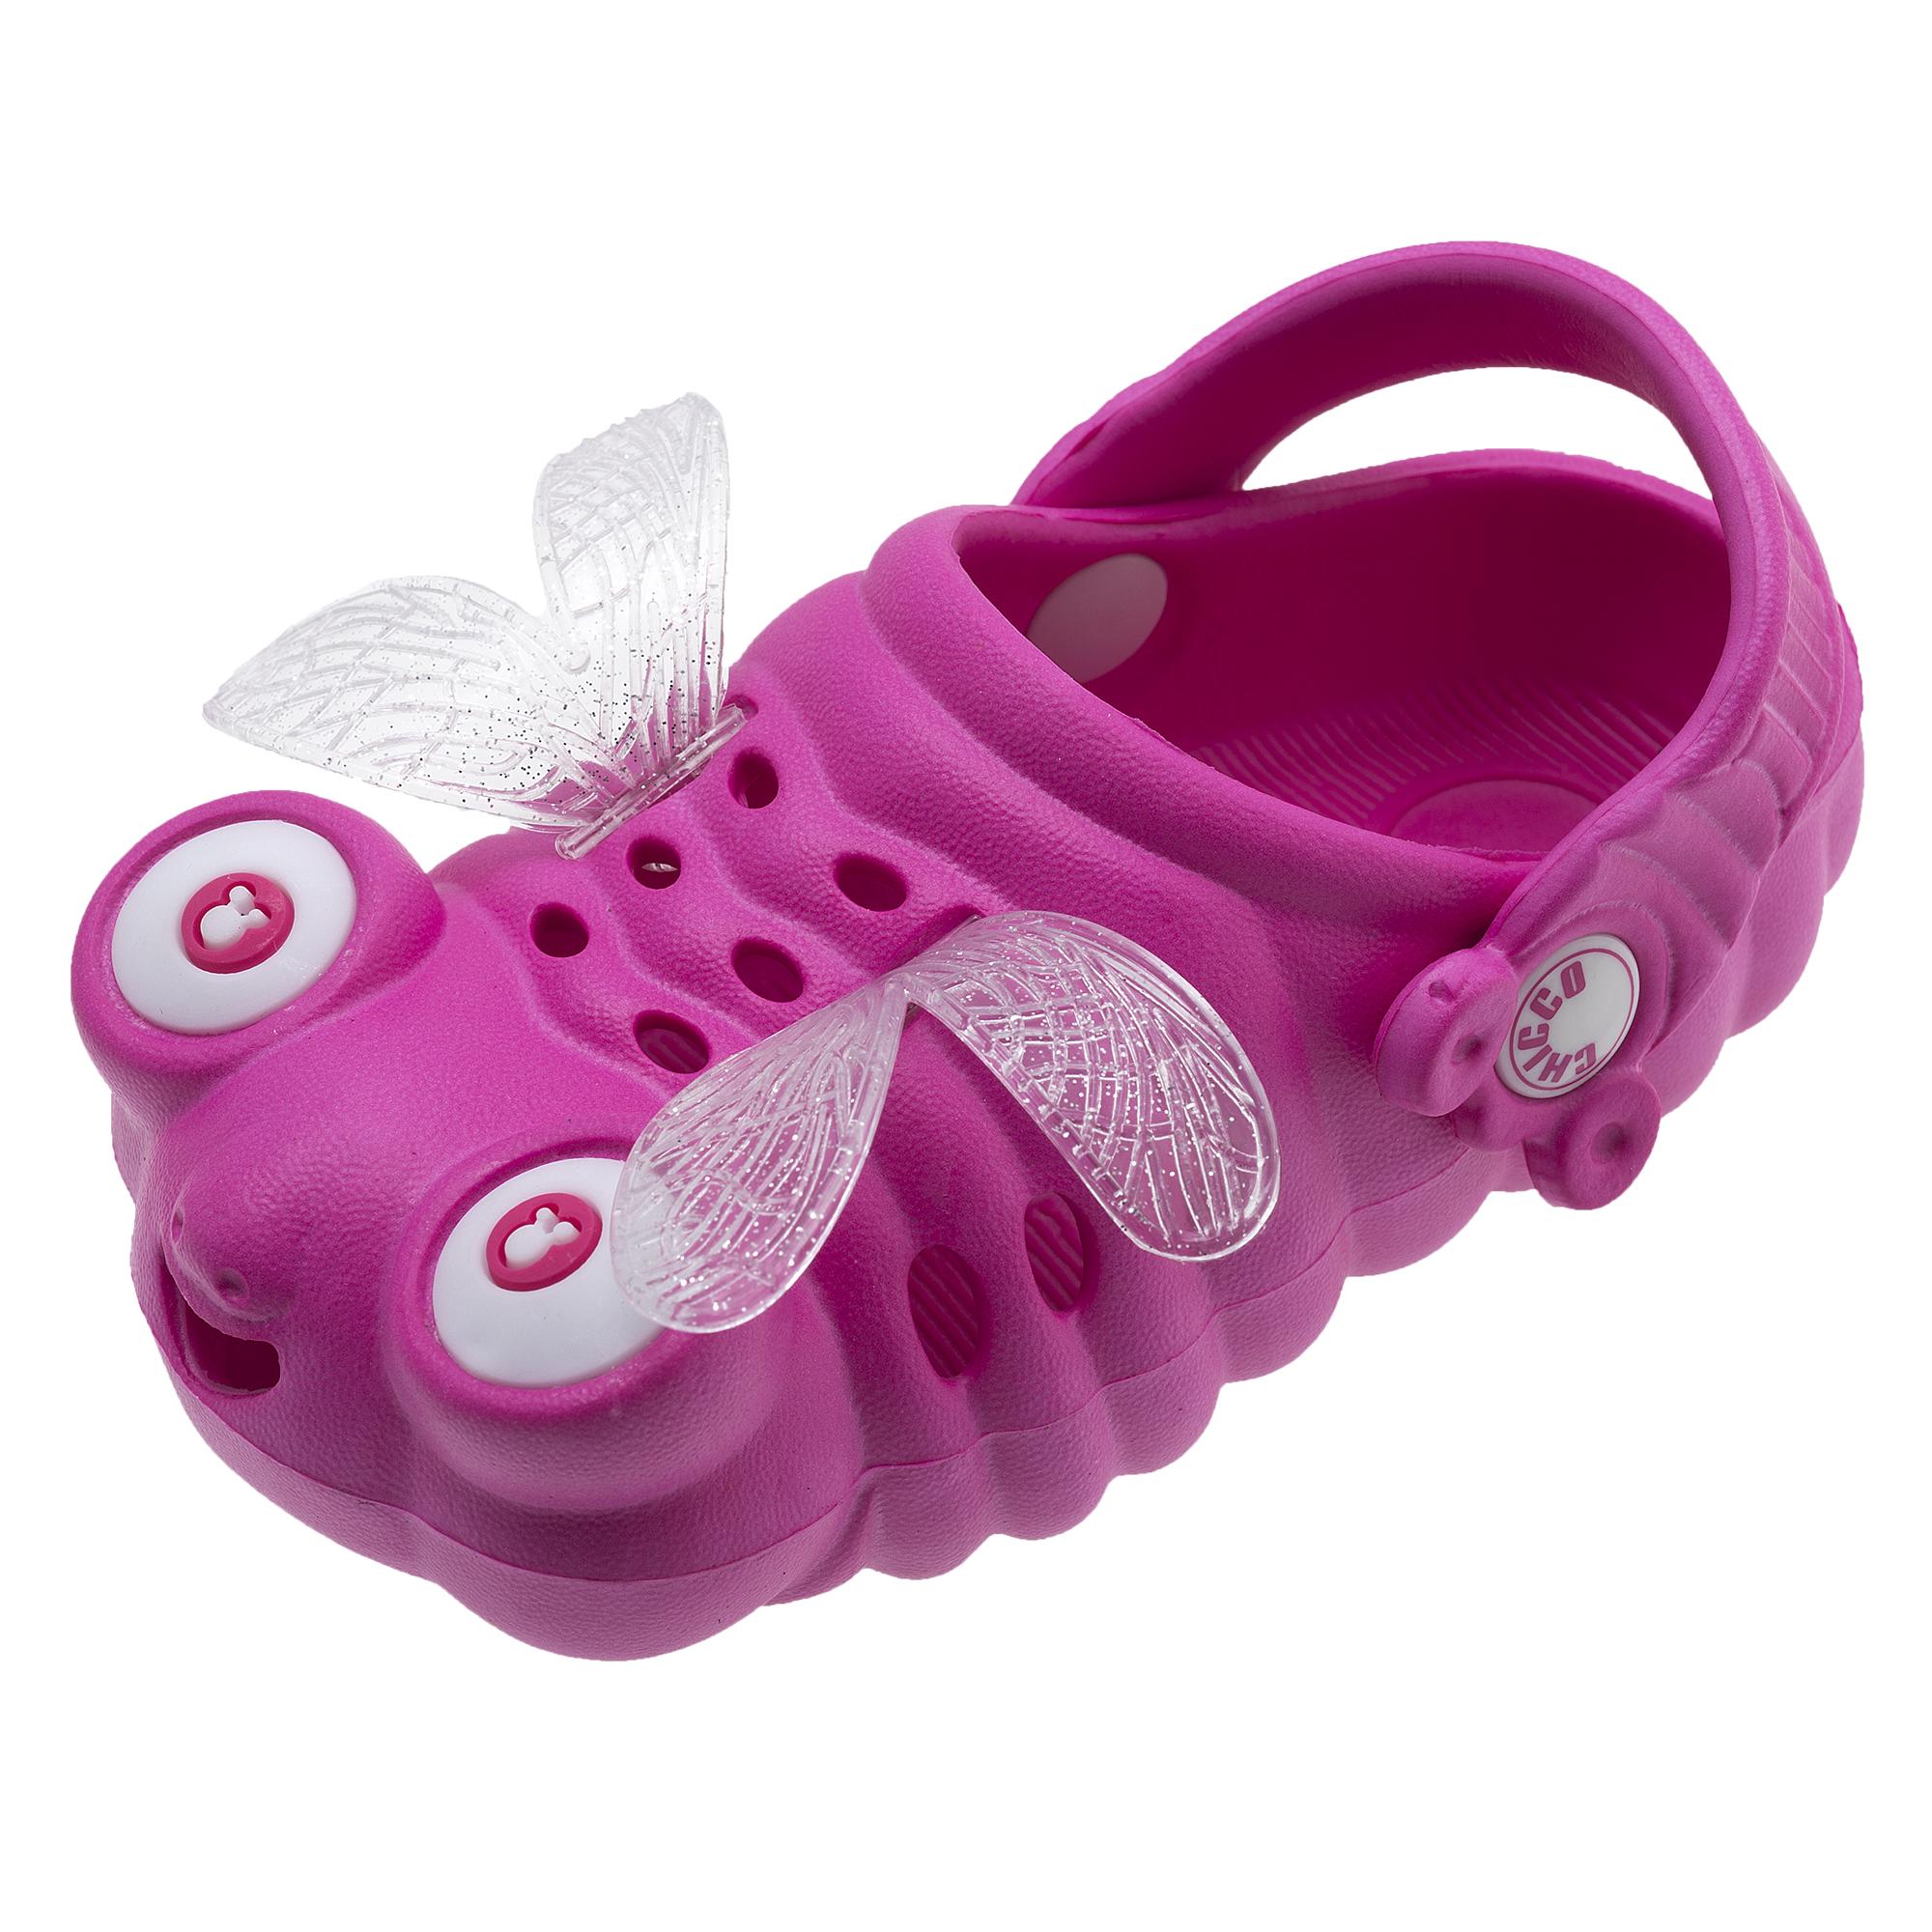 Papuci Copii Chicco Minorca, Roz, 63741 imagine